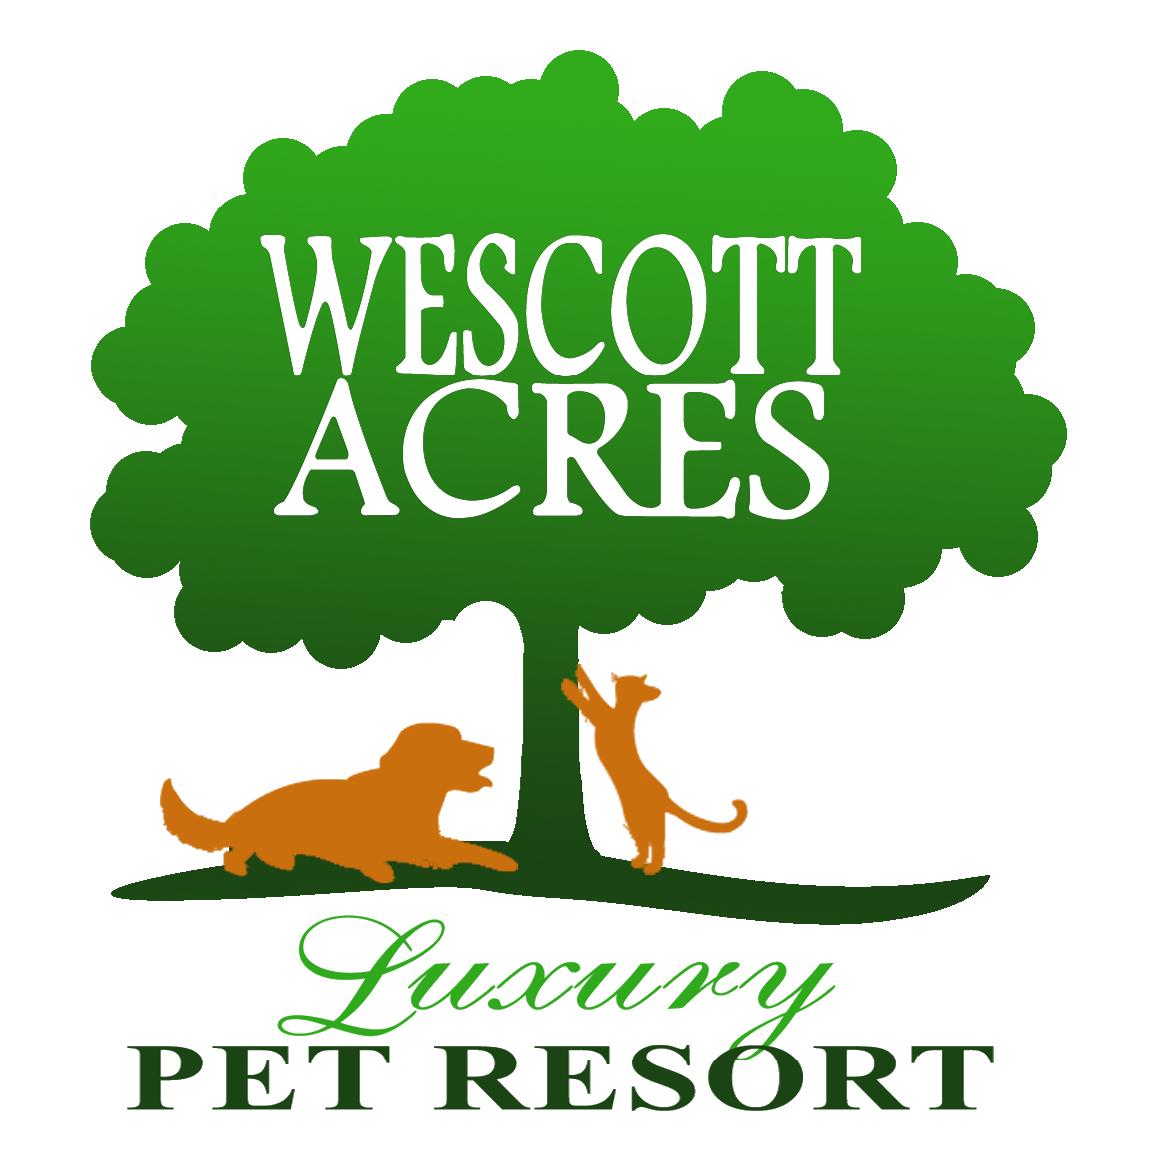 Wescott Acres